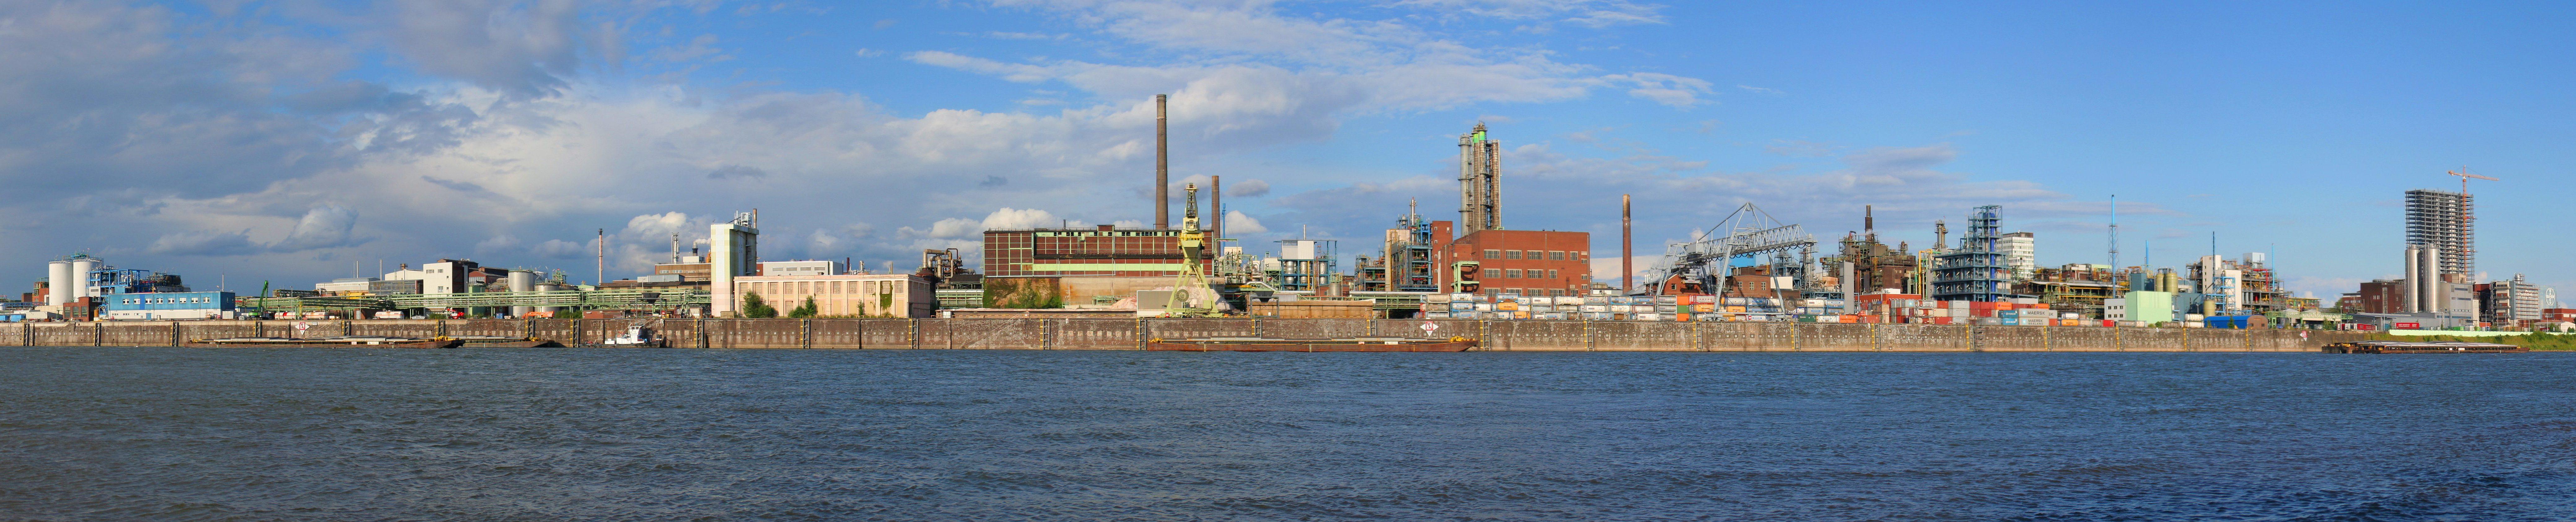 Panorama des Chemparks (CC BY-SA-A.Savin)